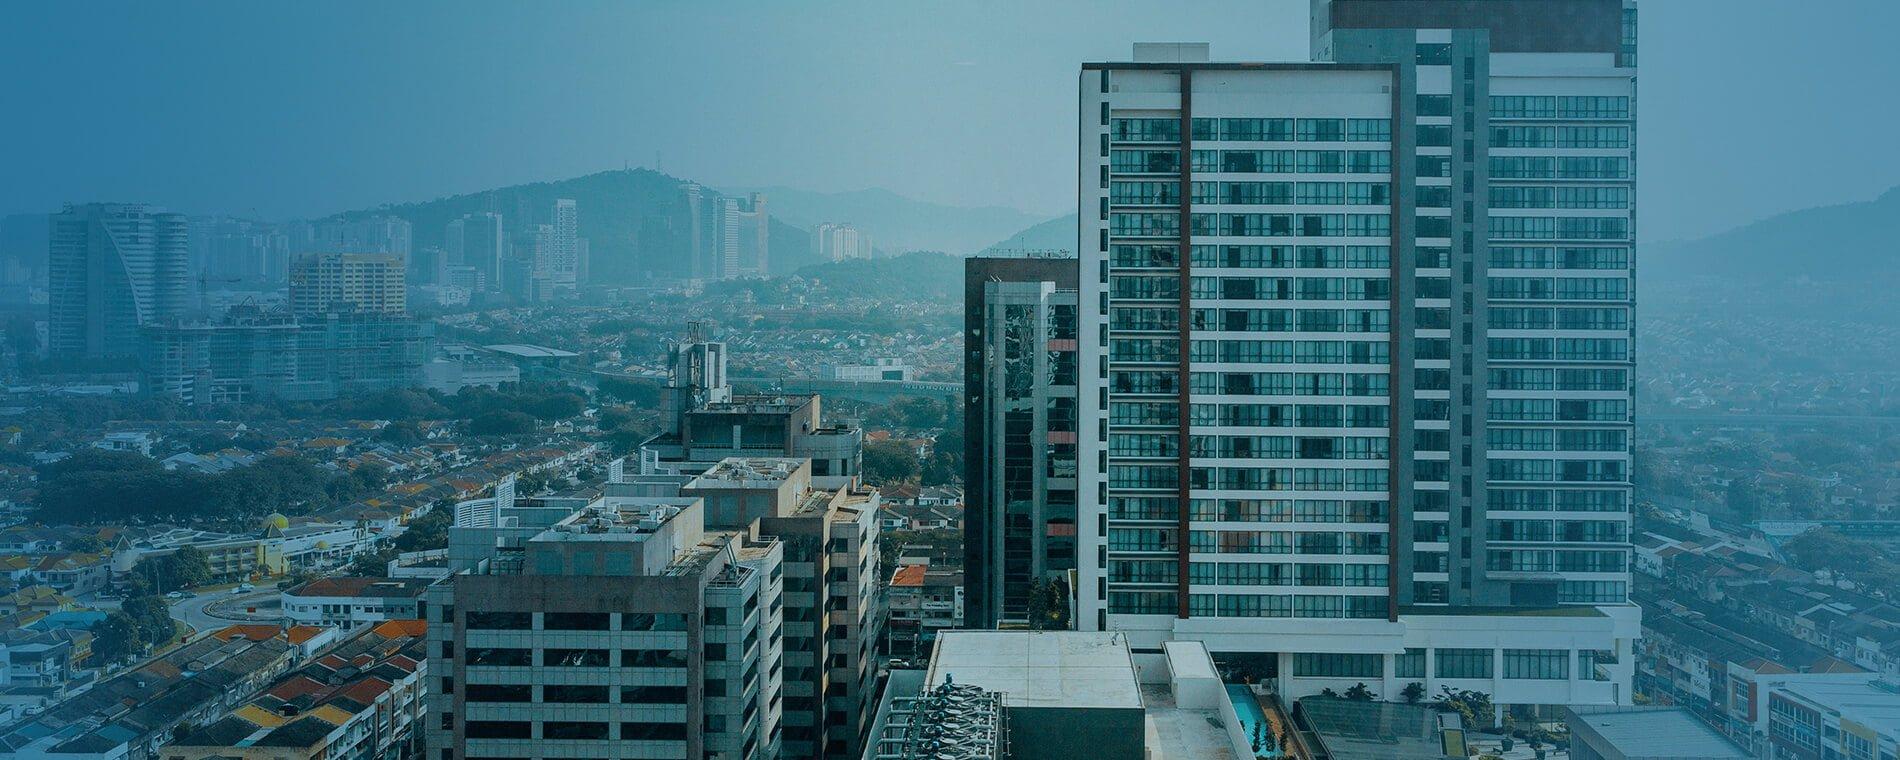 Web Hosting In Petaling Jaya